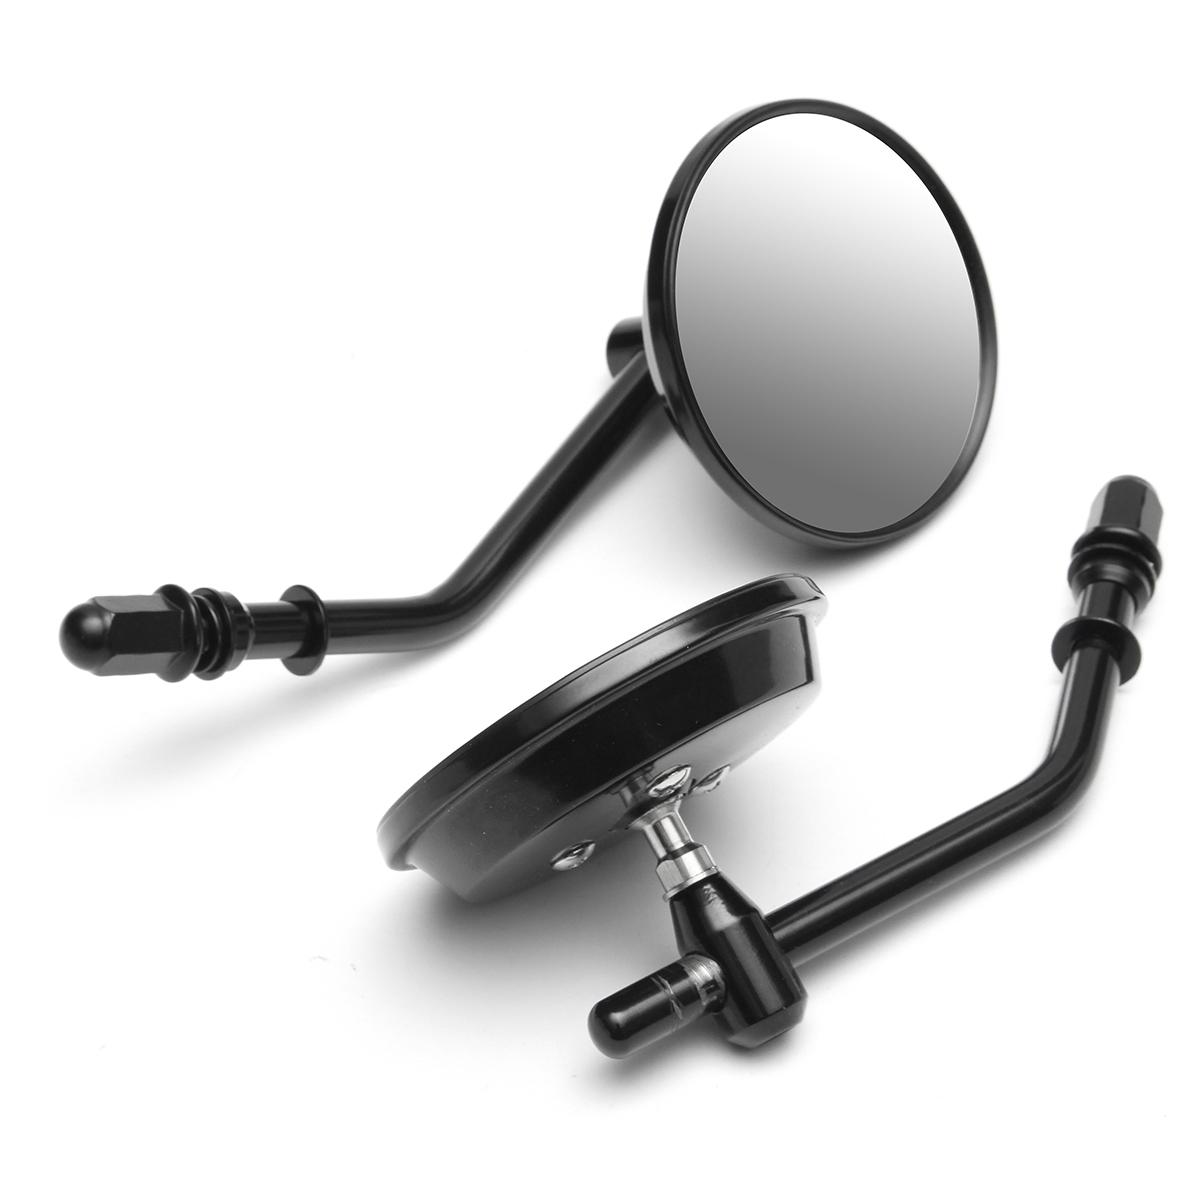 2 Moto Miroir extrémités du Guidon Miroir Set Alu CNC argent universel NEUF